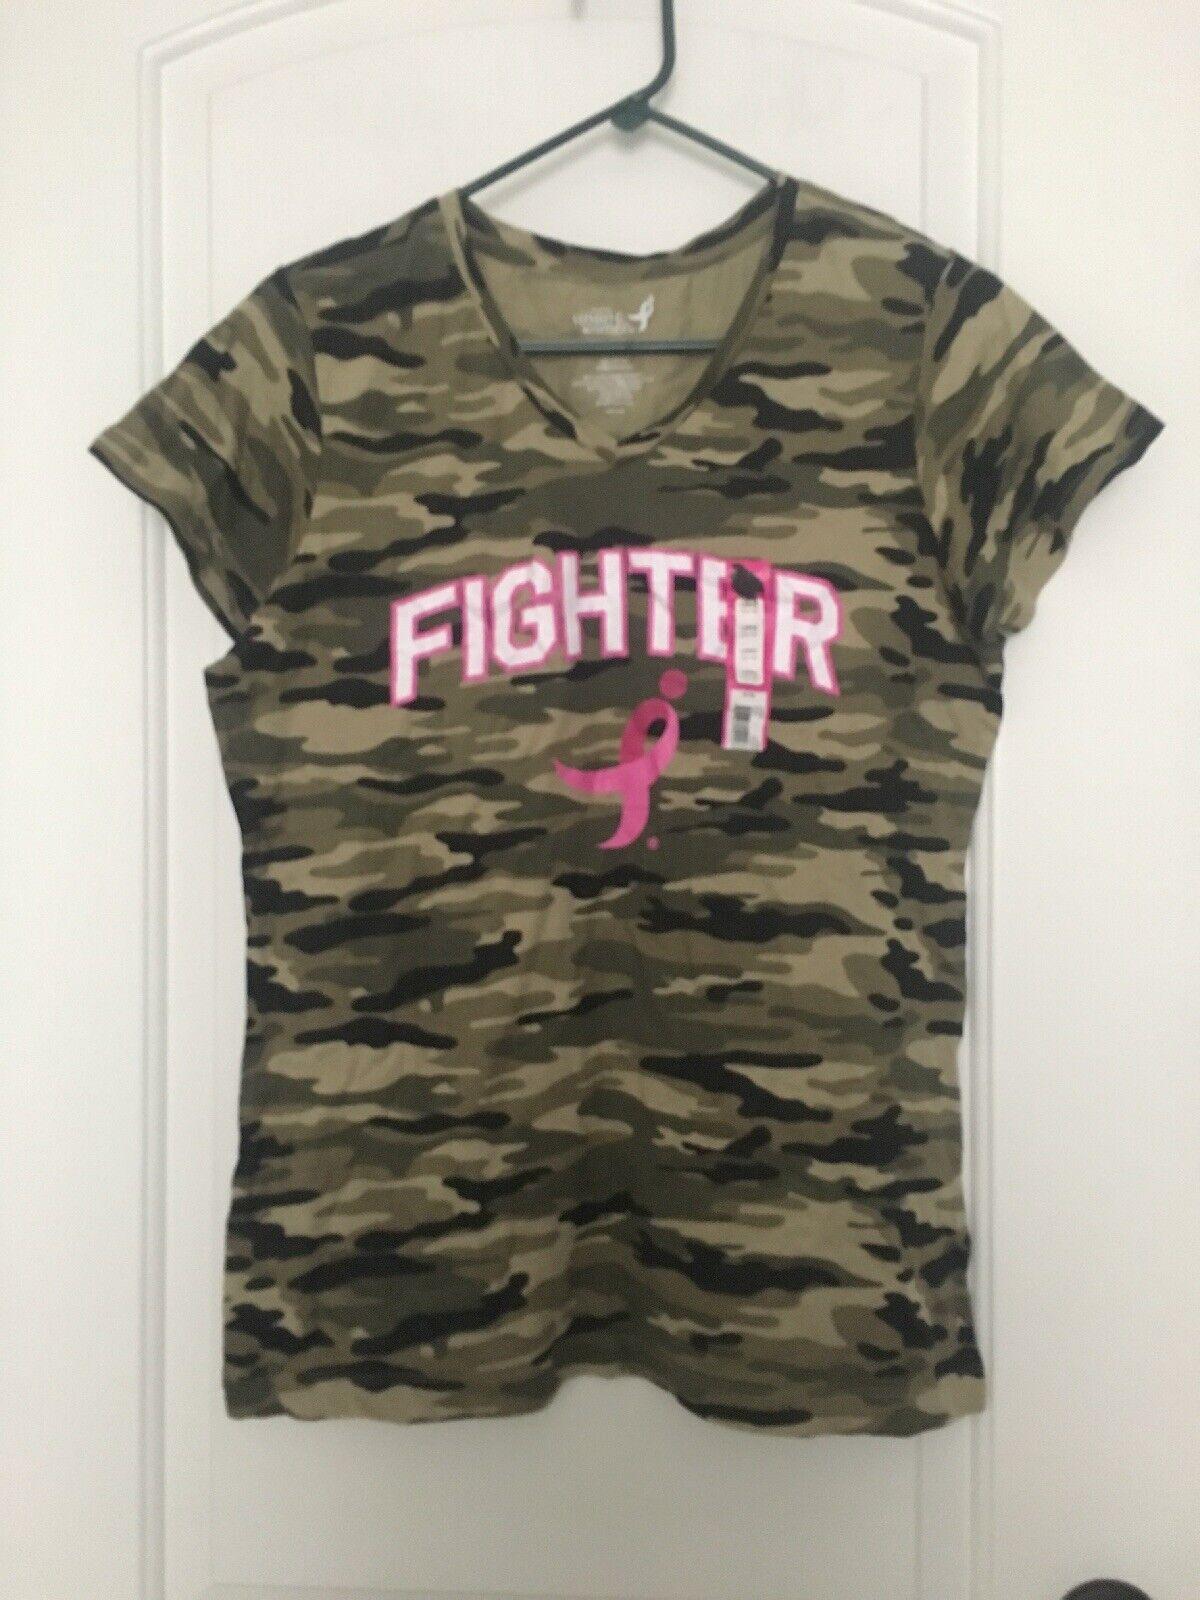 Susan Komen Woherren Breast Cancer FIGHTER Short Sleeve T Shirt Sz L Top Clothes